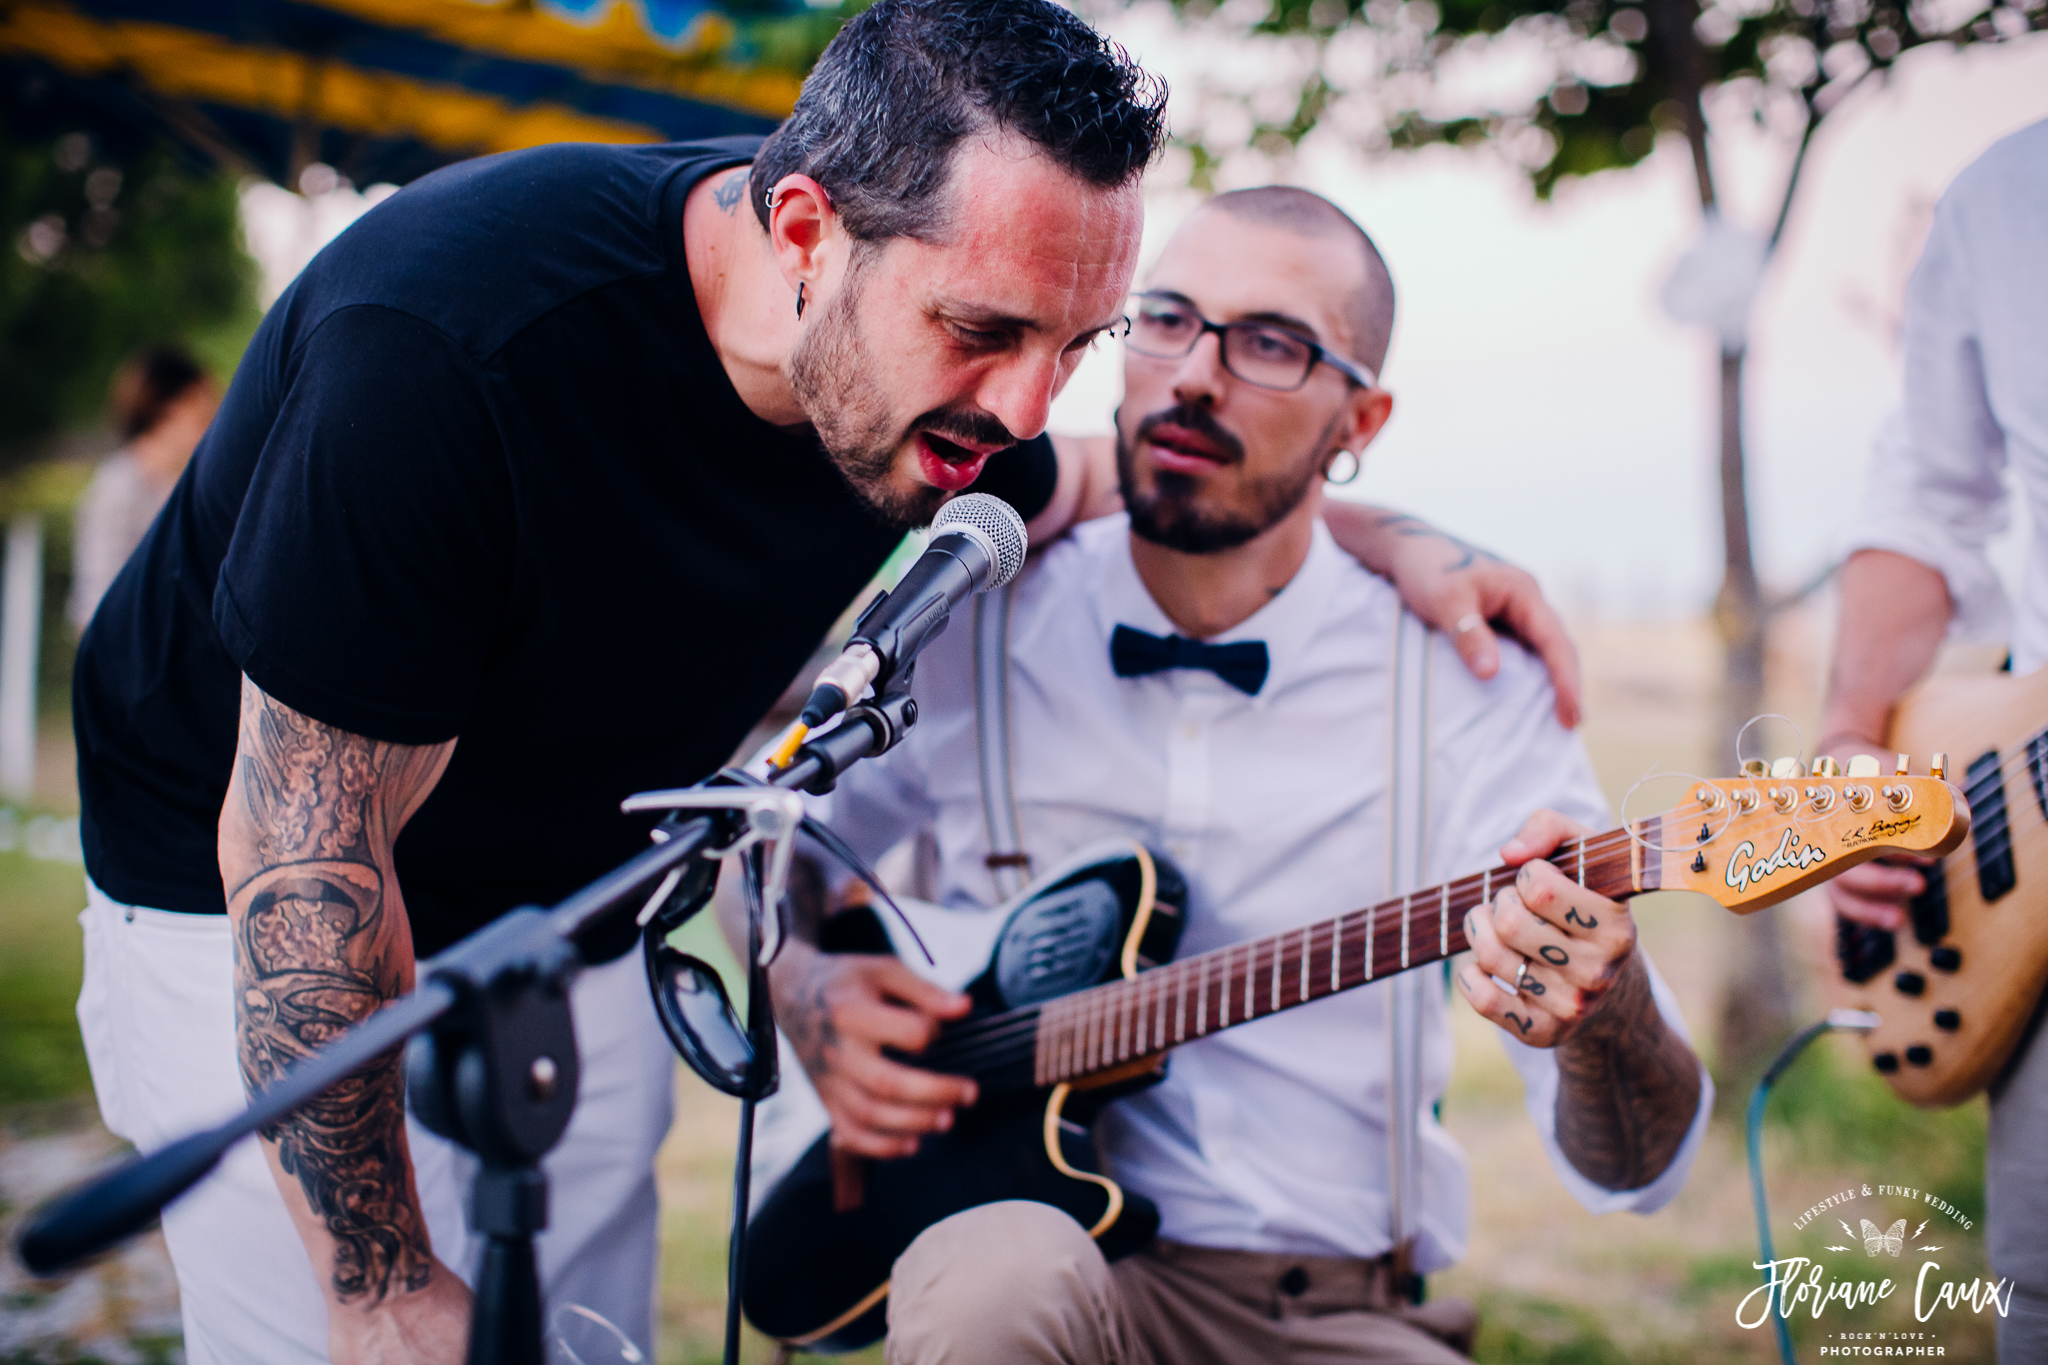 photographe-mariage-toulouse-rocknroll-maries-tatoues-floriane-caux-102